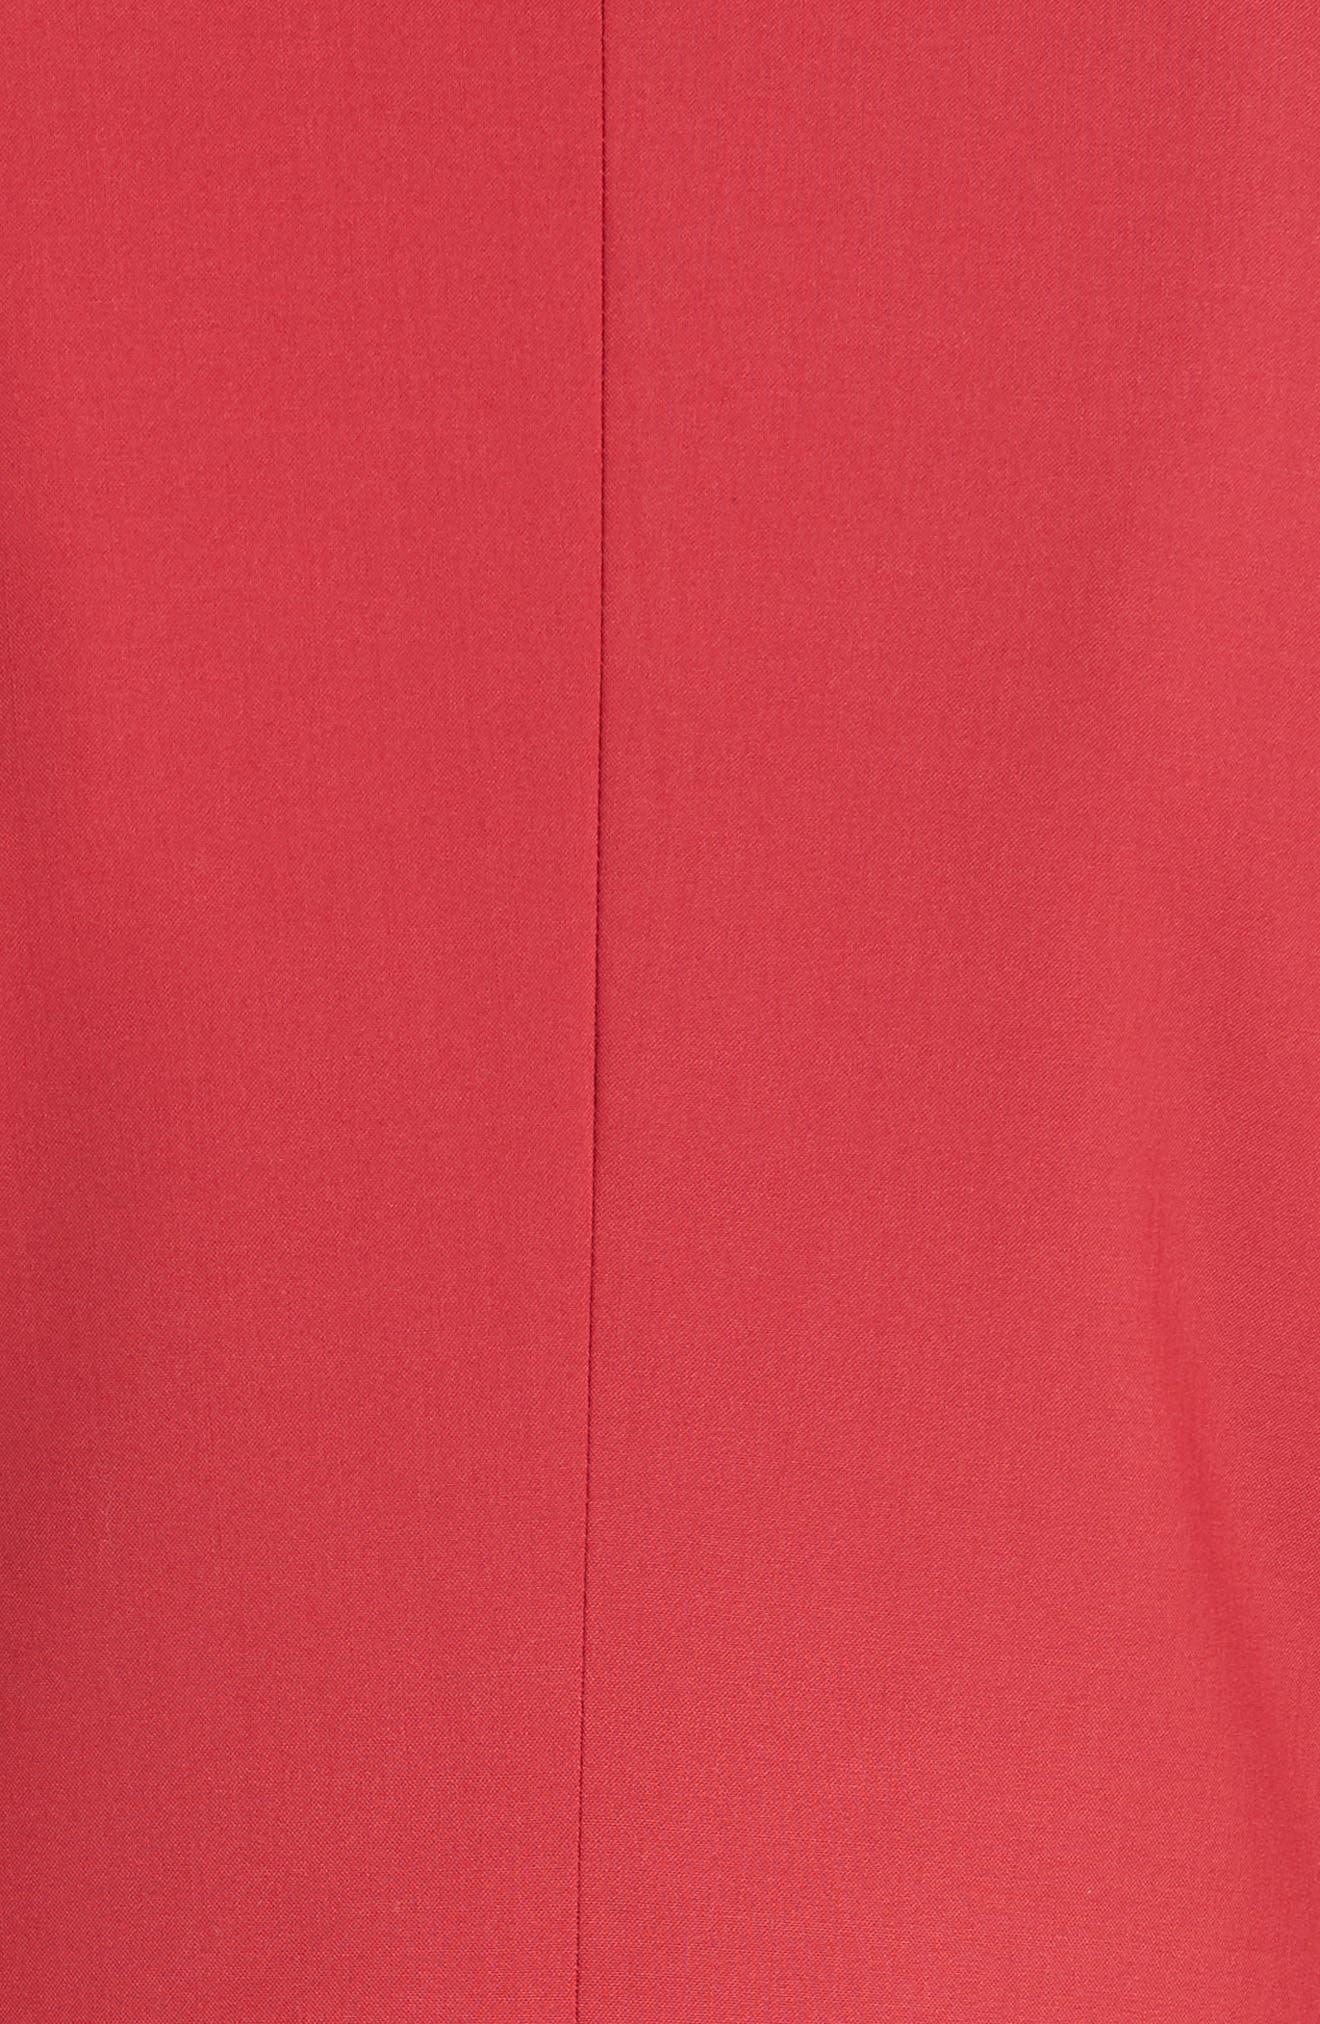 Etienette B Good Wool Suit Jacket,                             Alternate thumbnail 40, color,